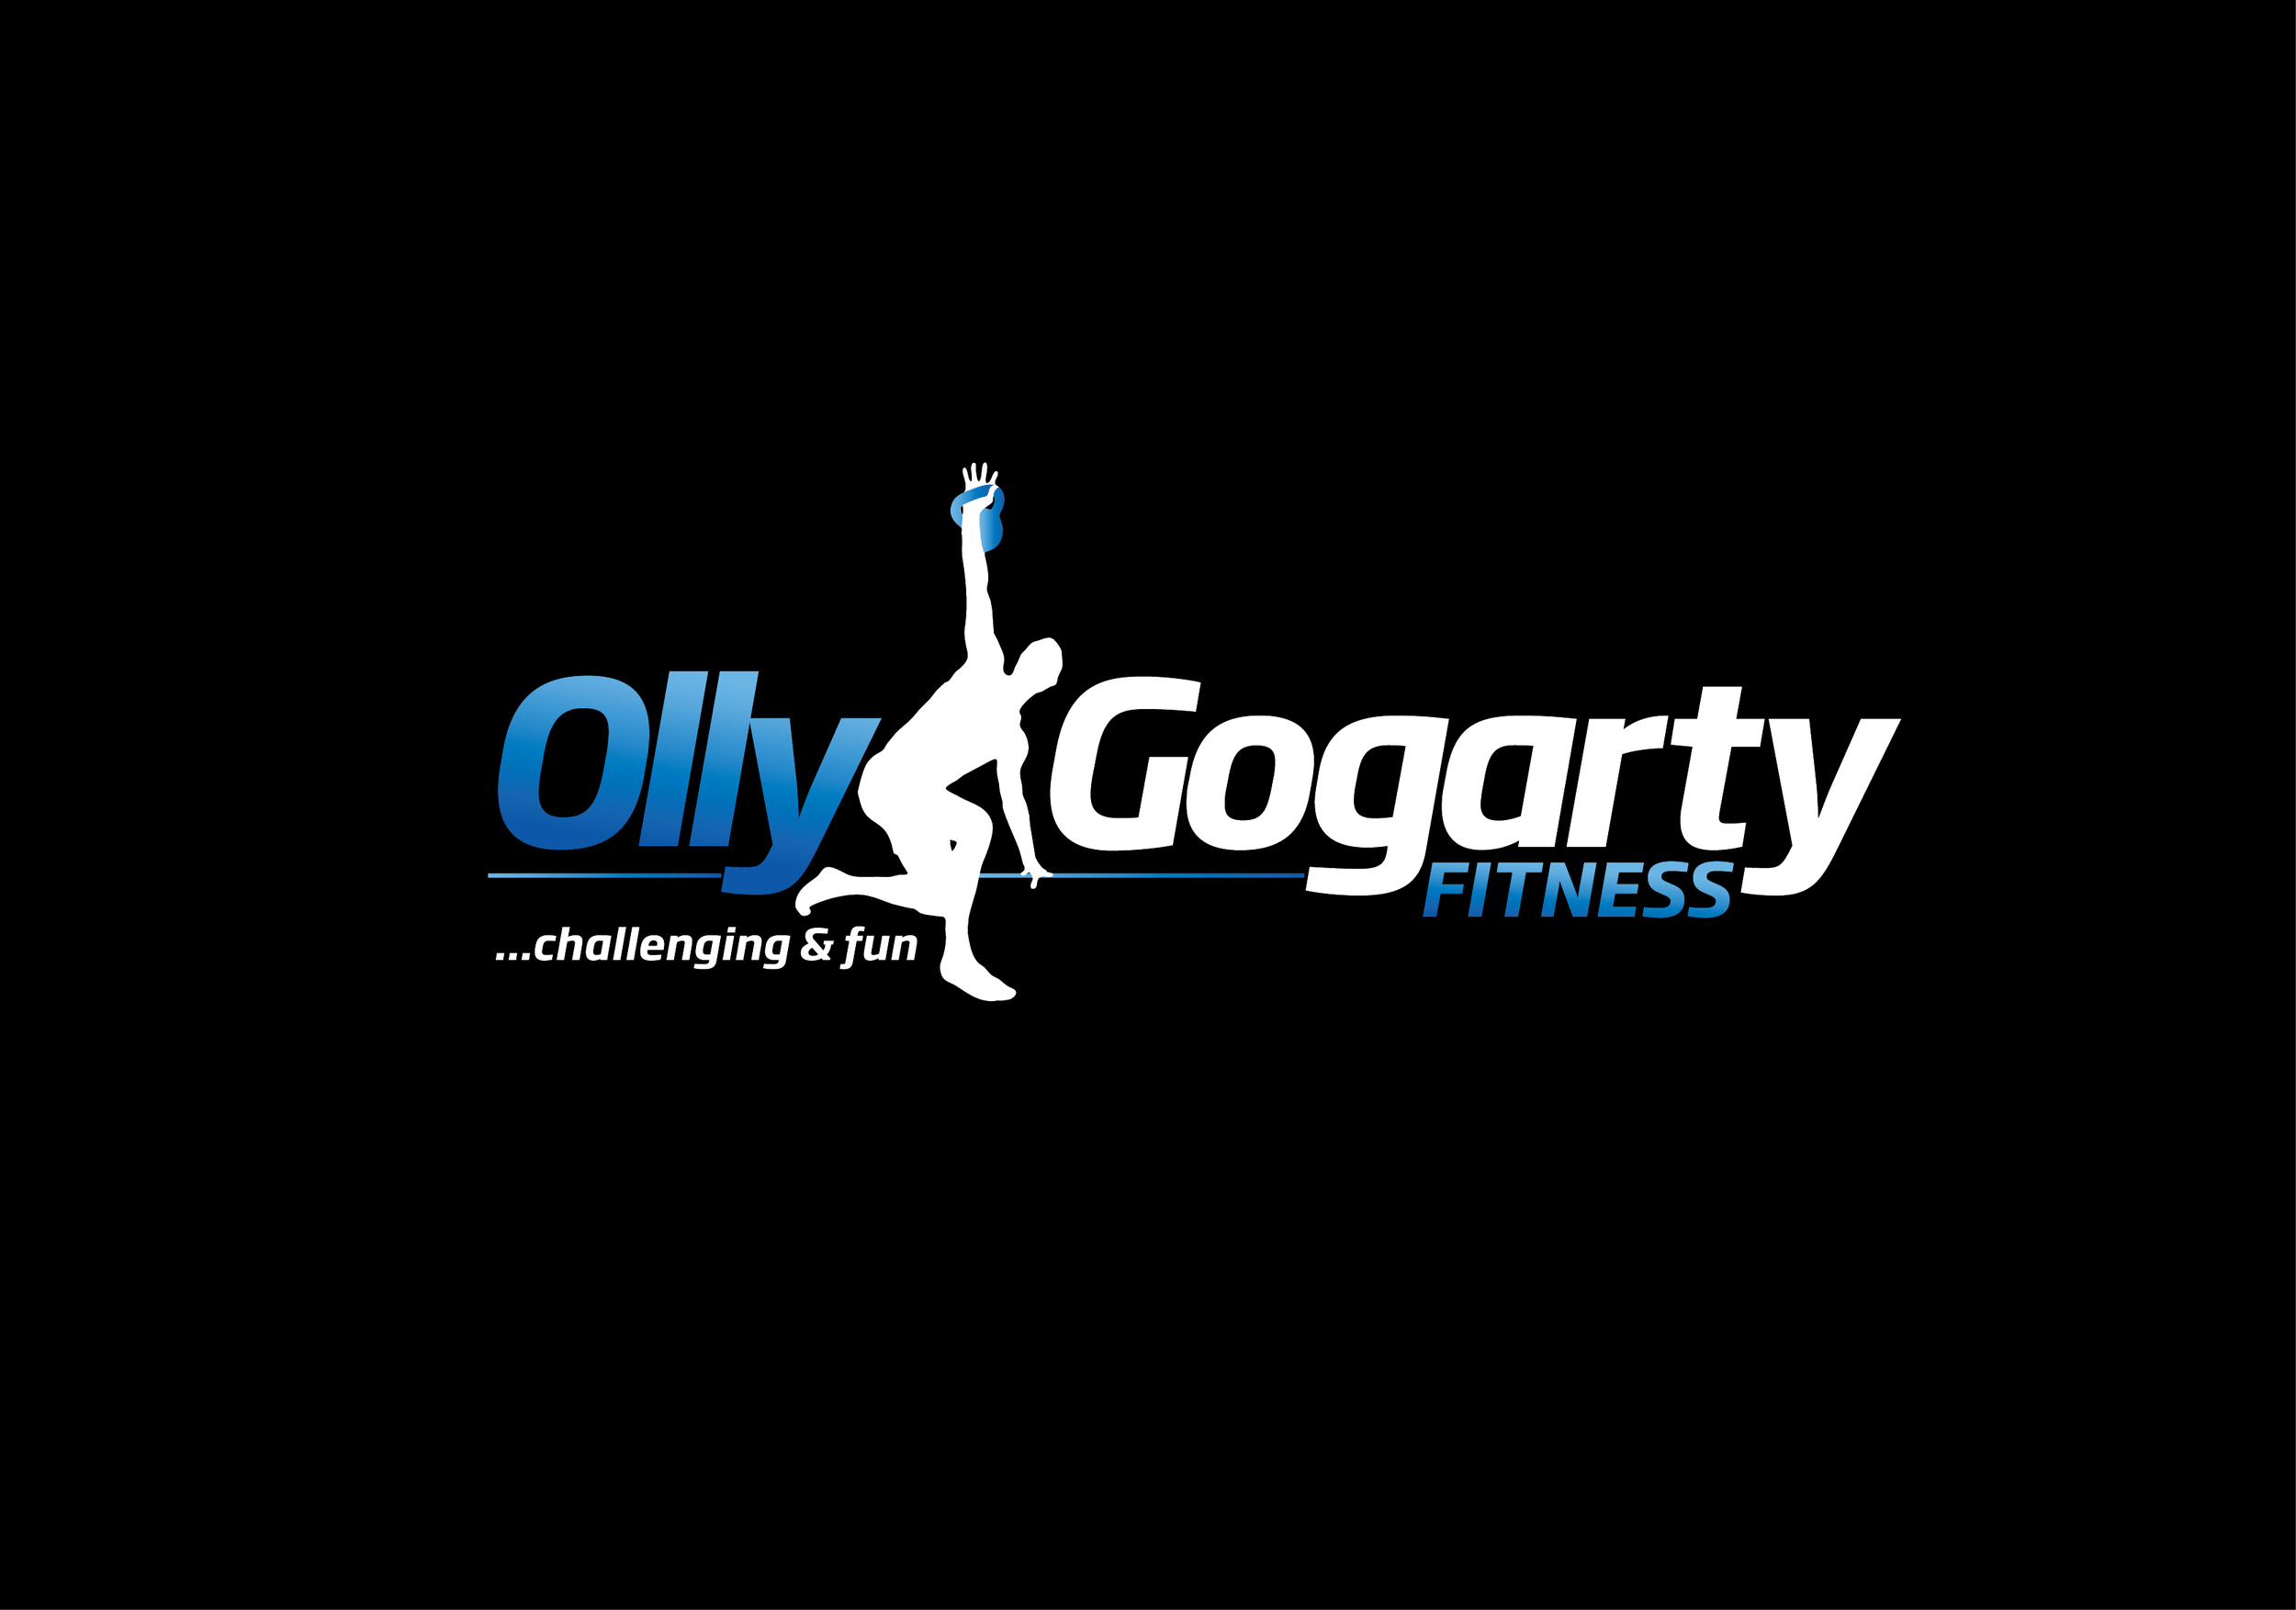 Ollygogartyfitness,com